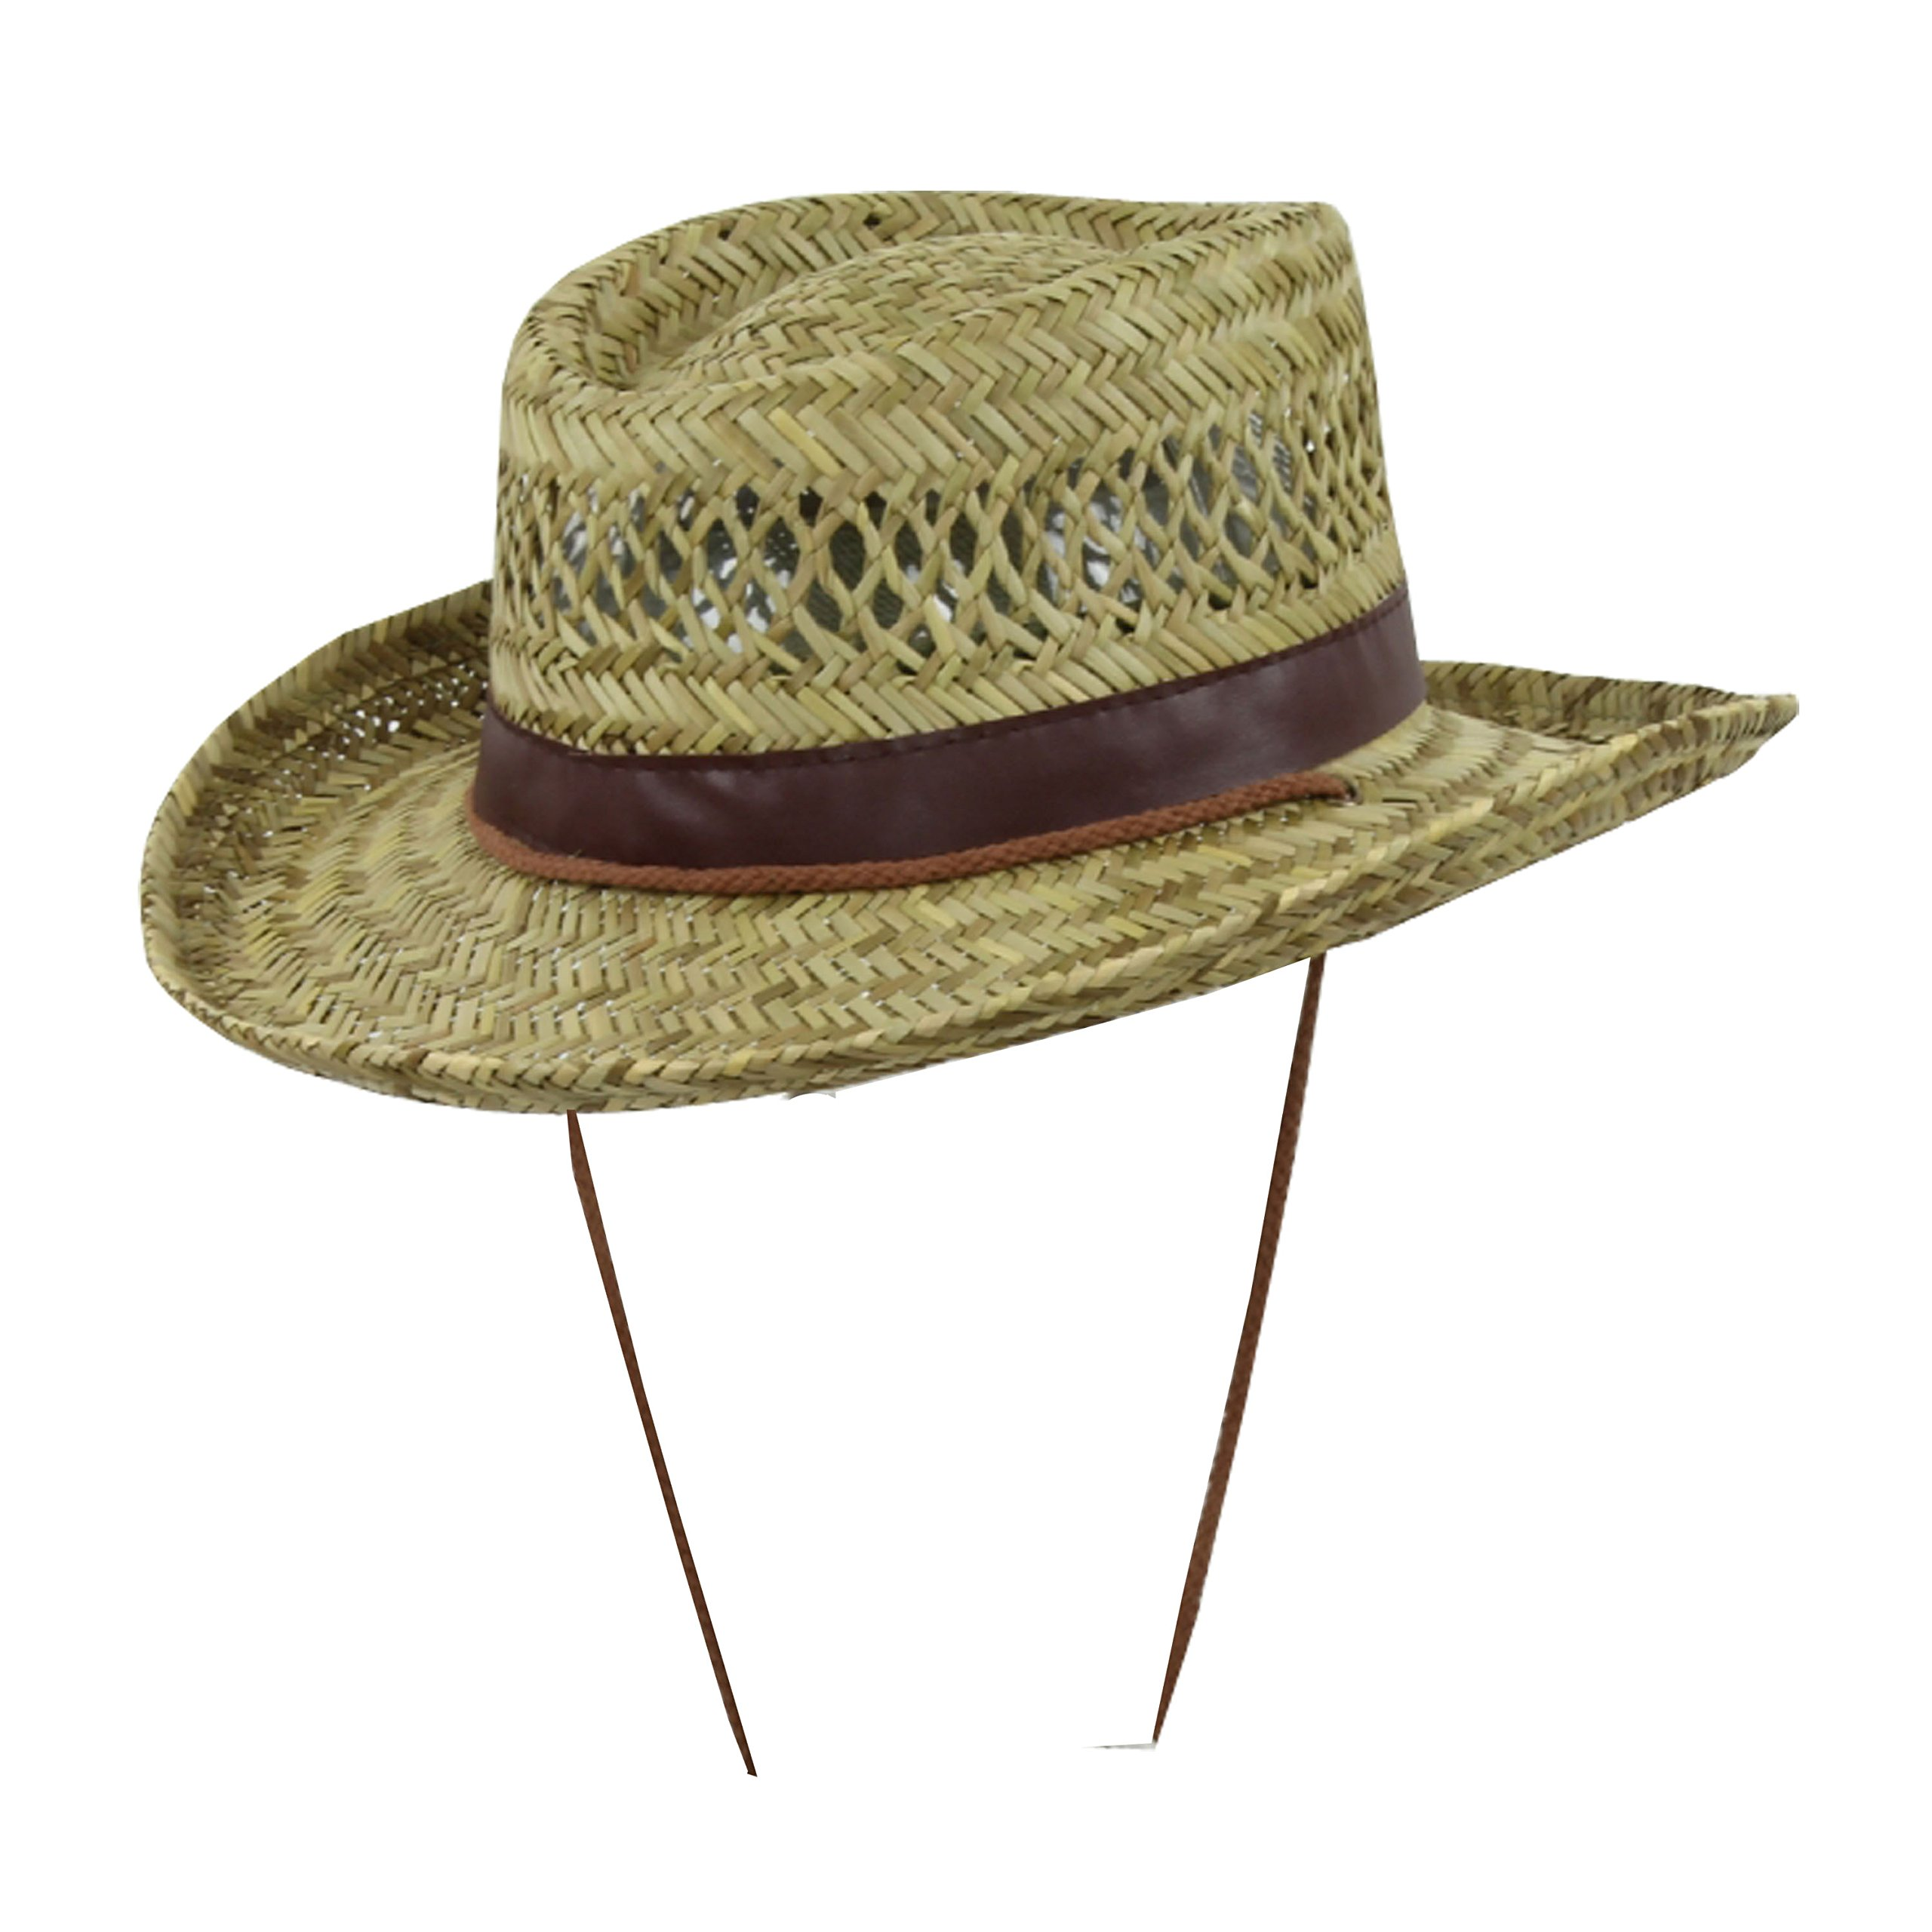 Classic Straw Flat Top Gambler Sun Hat w/ Vegan Leather and Chin Strap